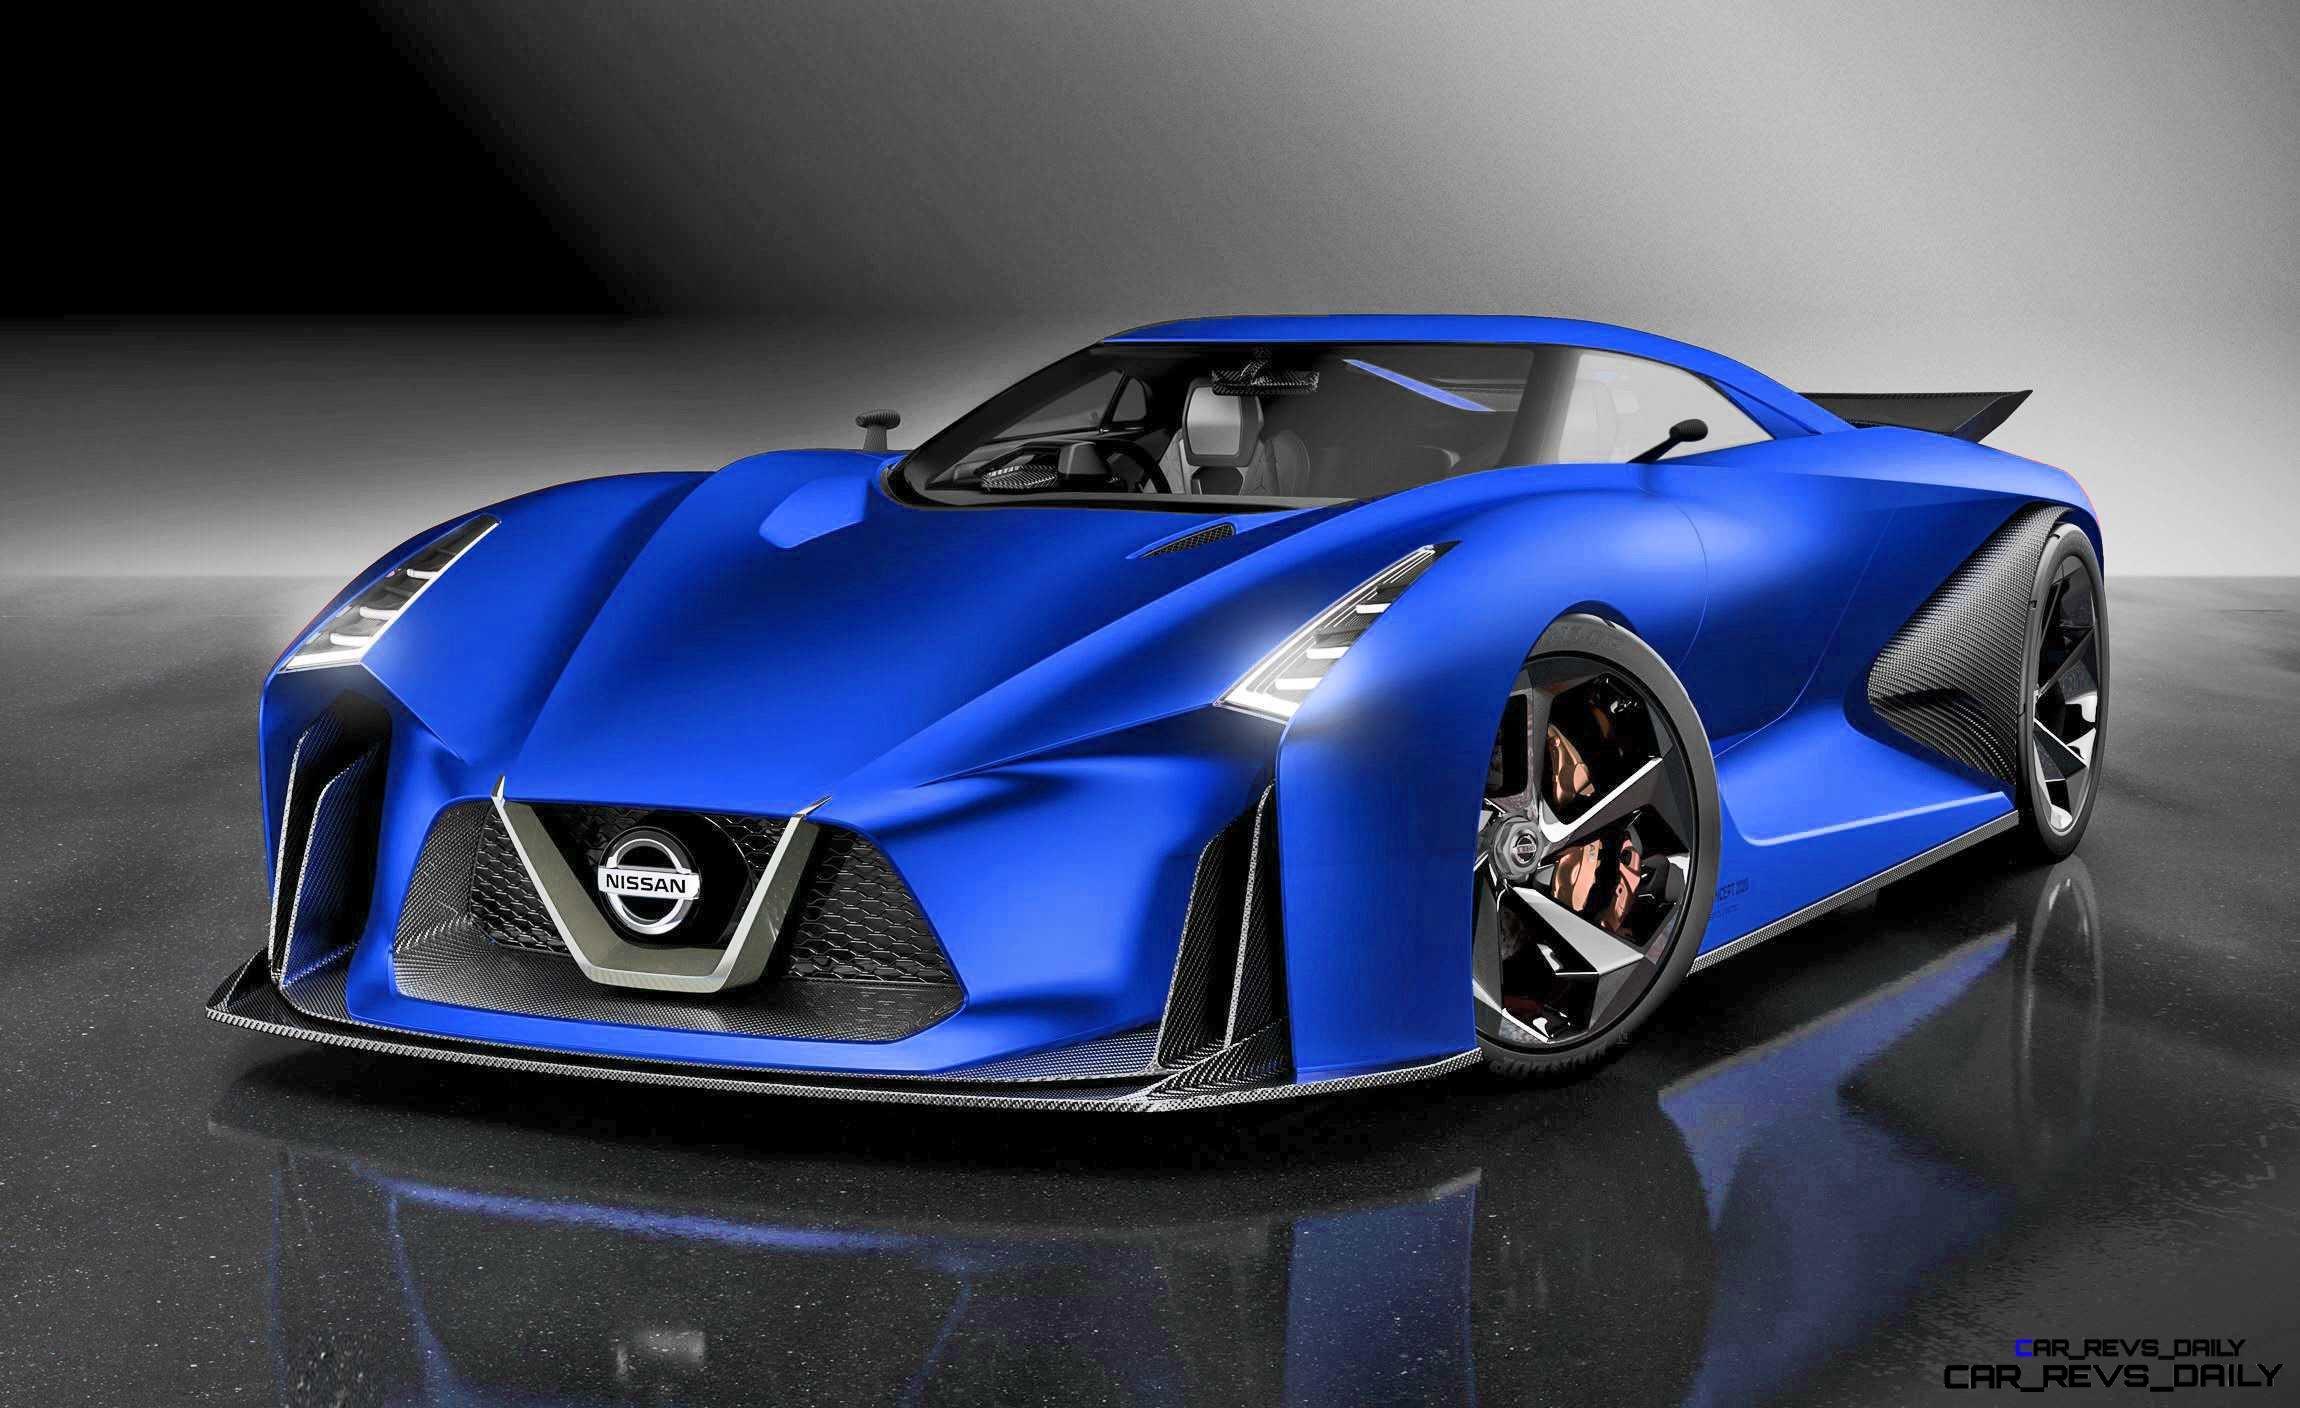 Nissan NC2020 Vision Gran Turismo Red